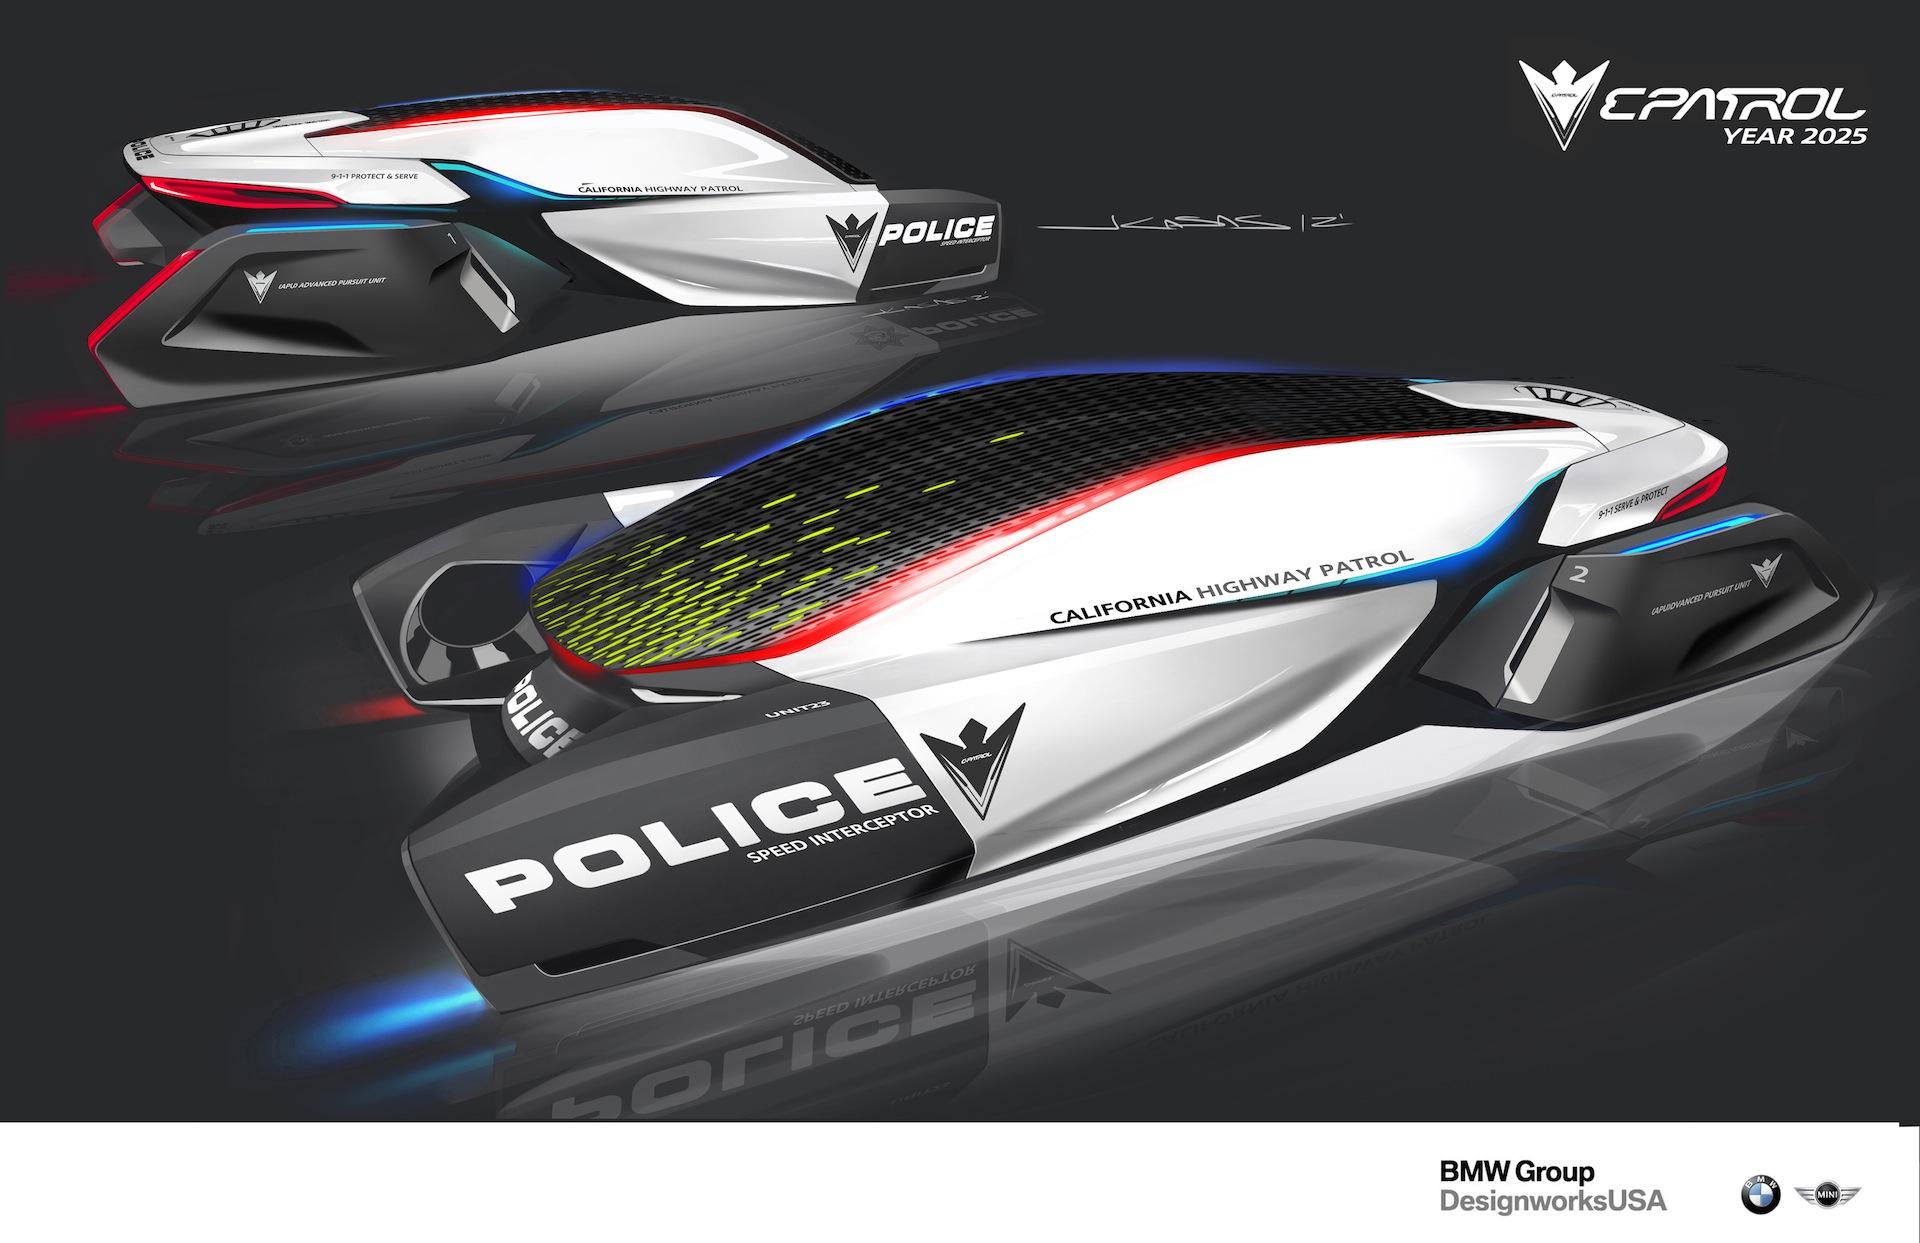 epatrol bmw designworksusa shows vision of future police